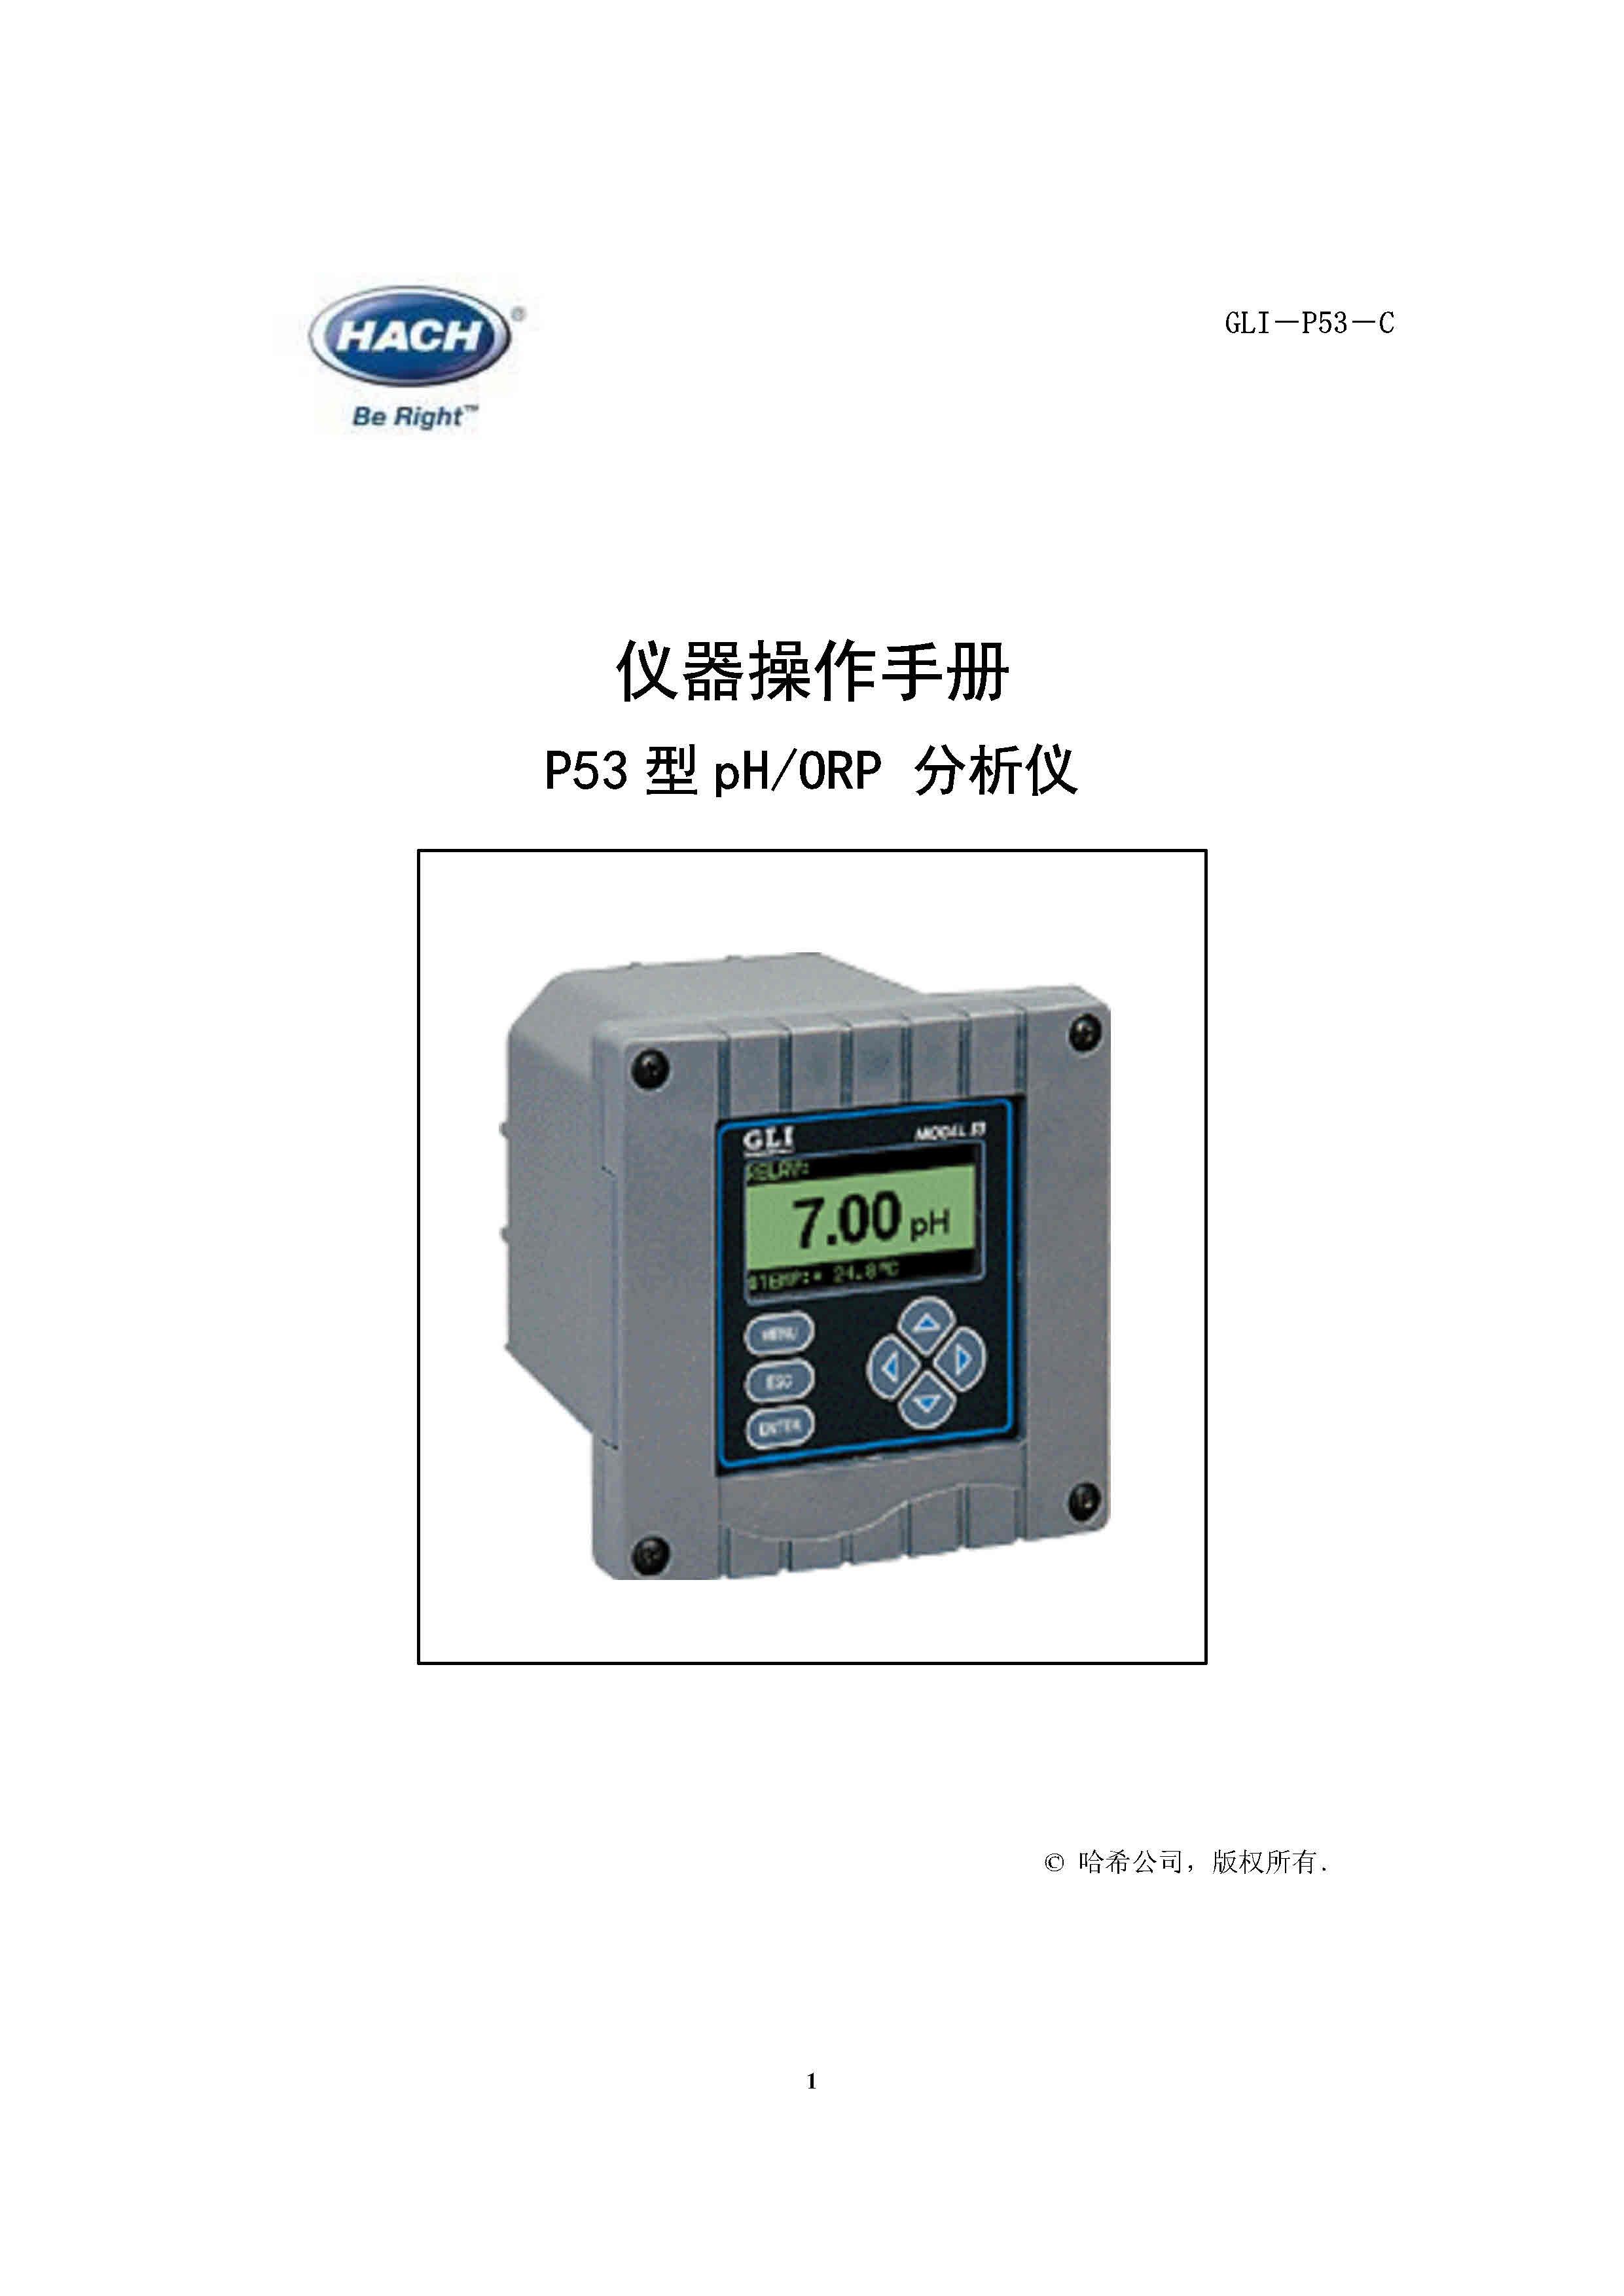 HACH GLI  哈希P53 pHORP仪器操作手册